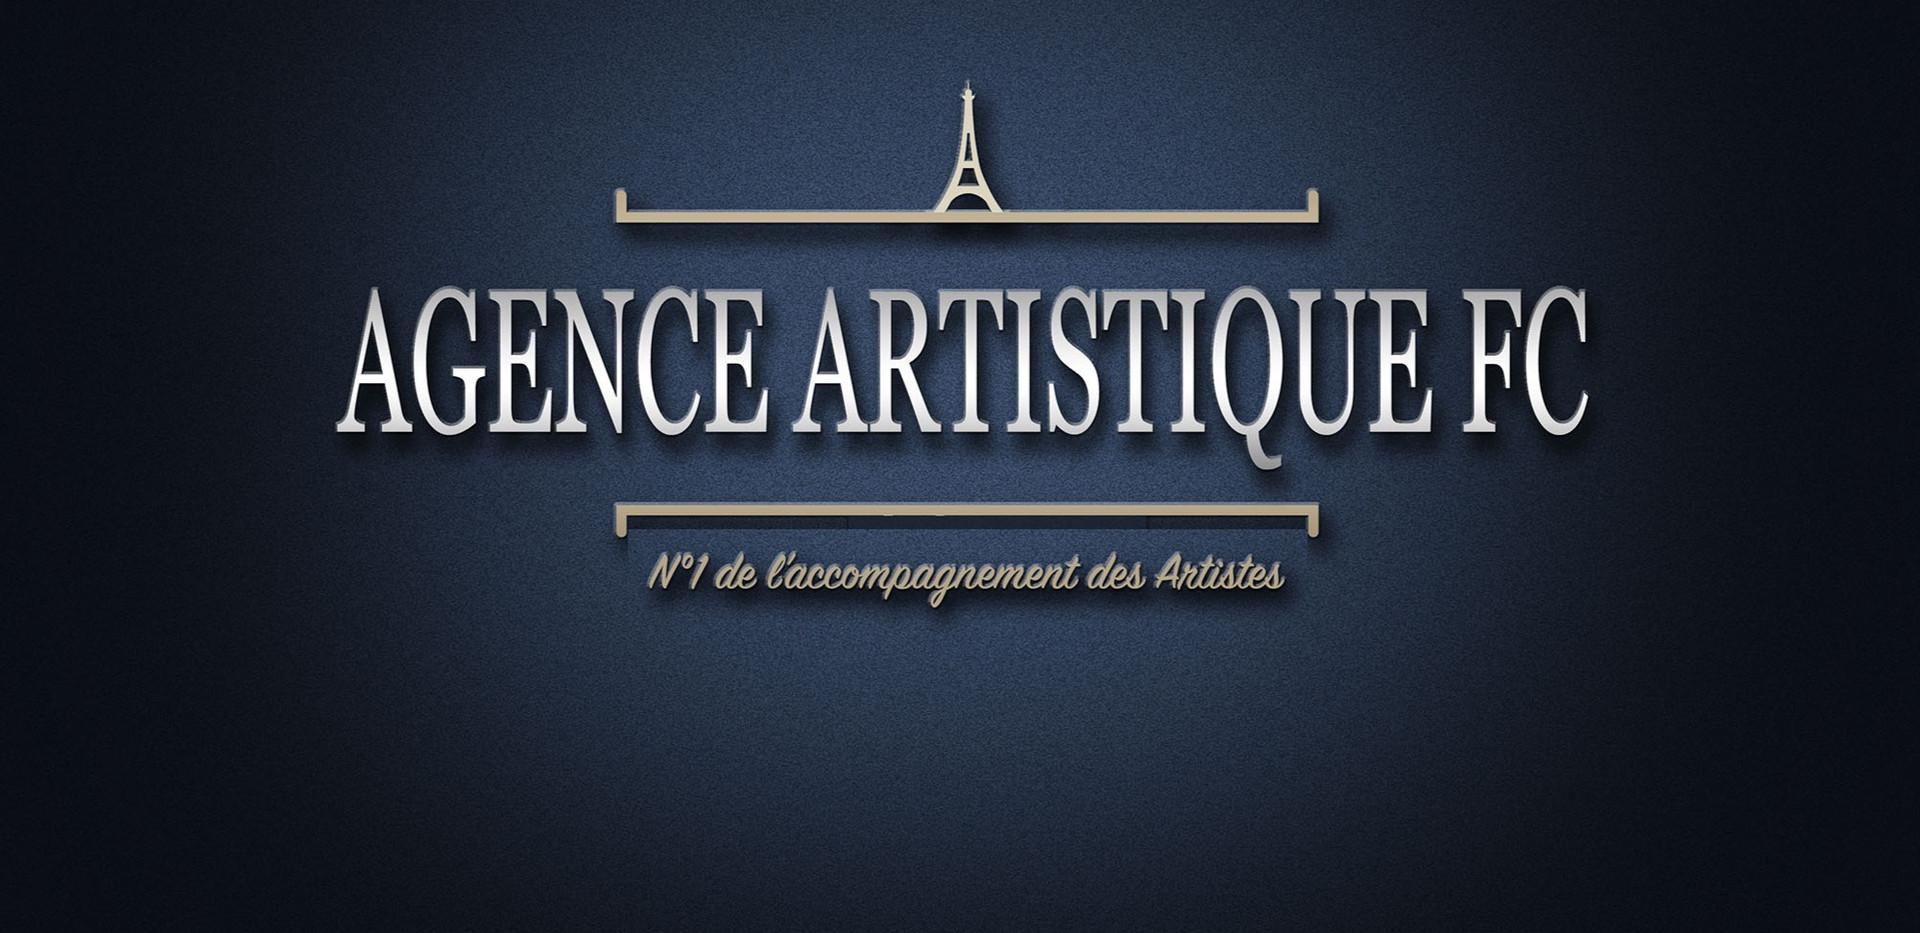 Agence Artistique FC